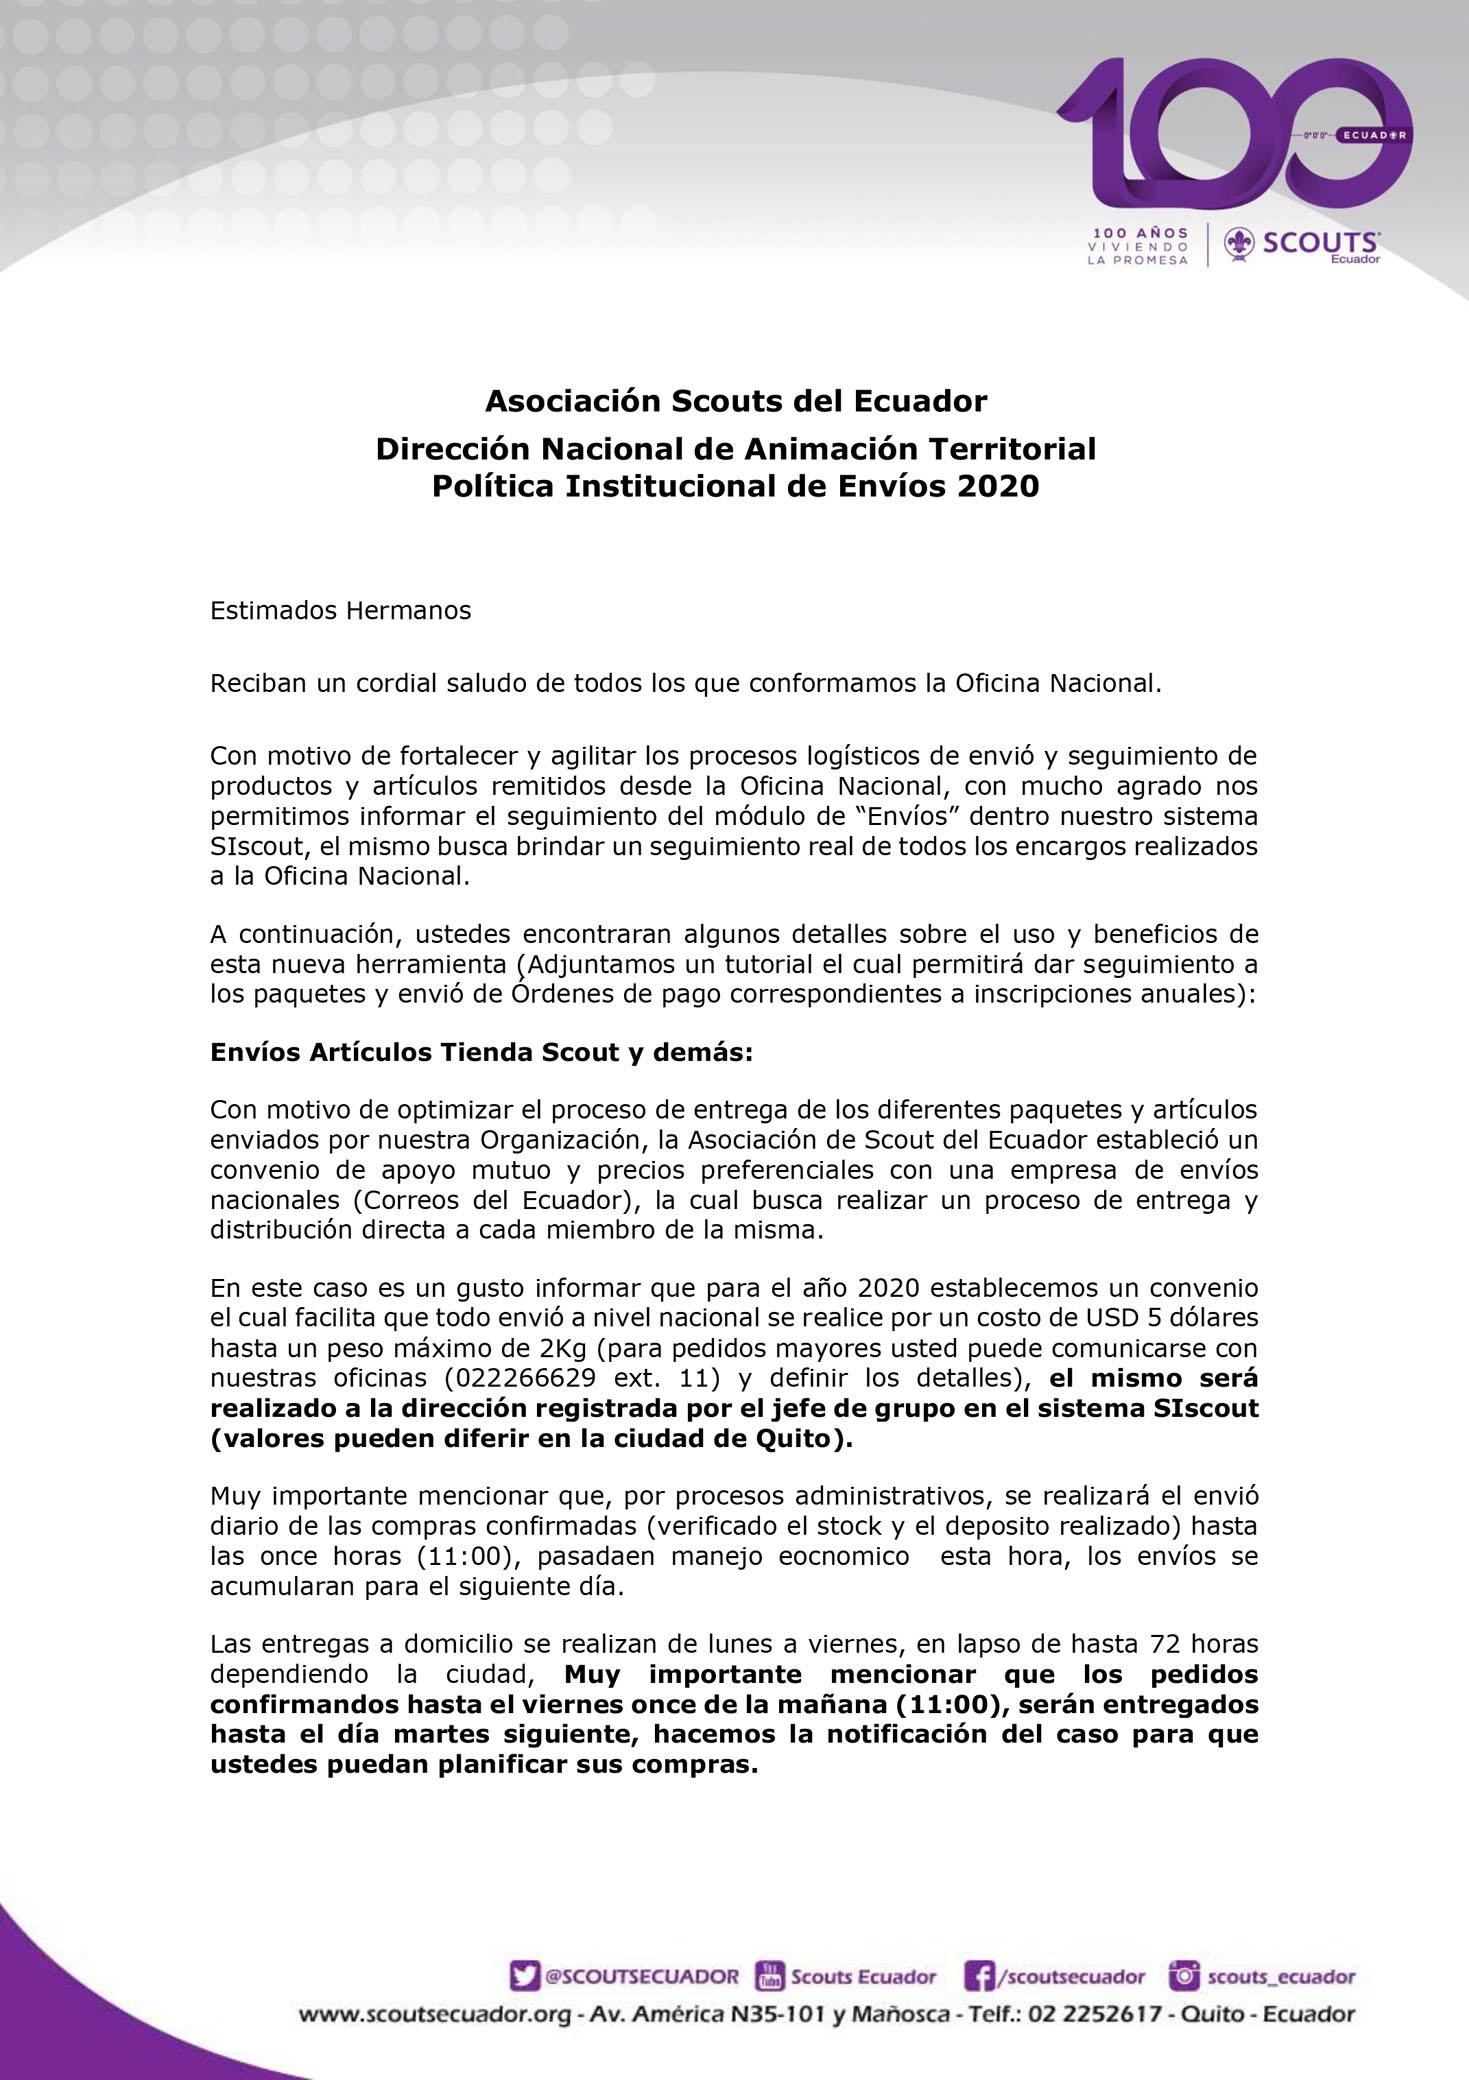 Politica de envios Scouts Ecuador 2020